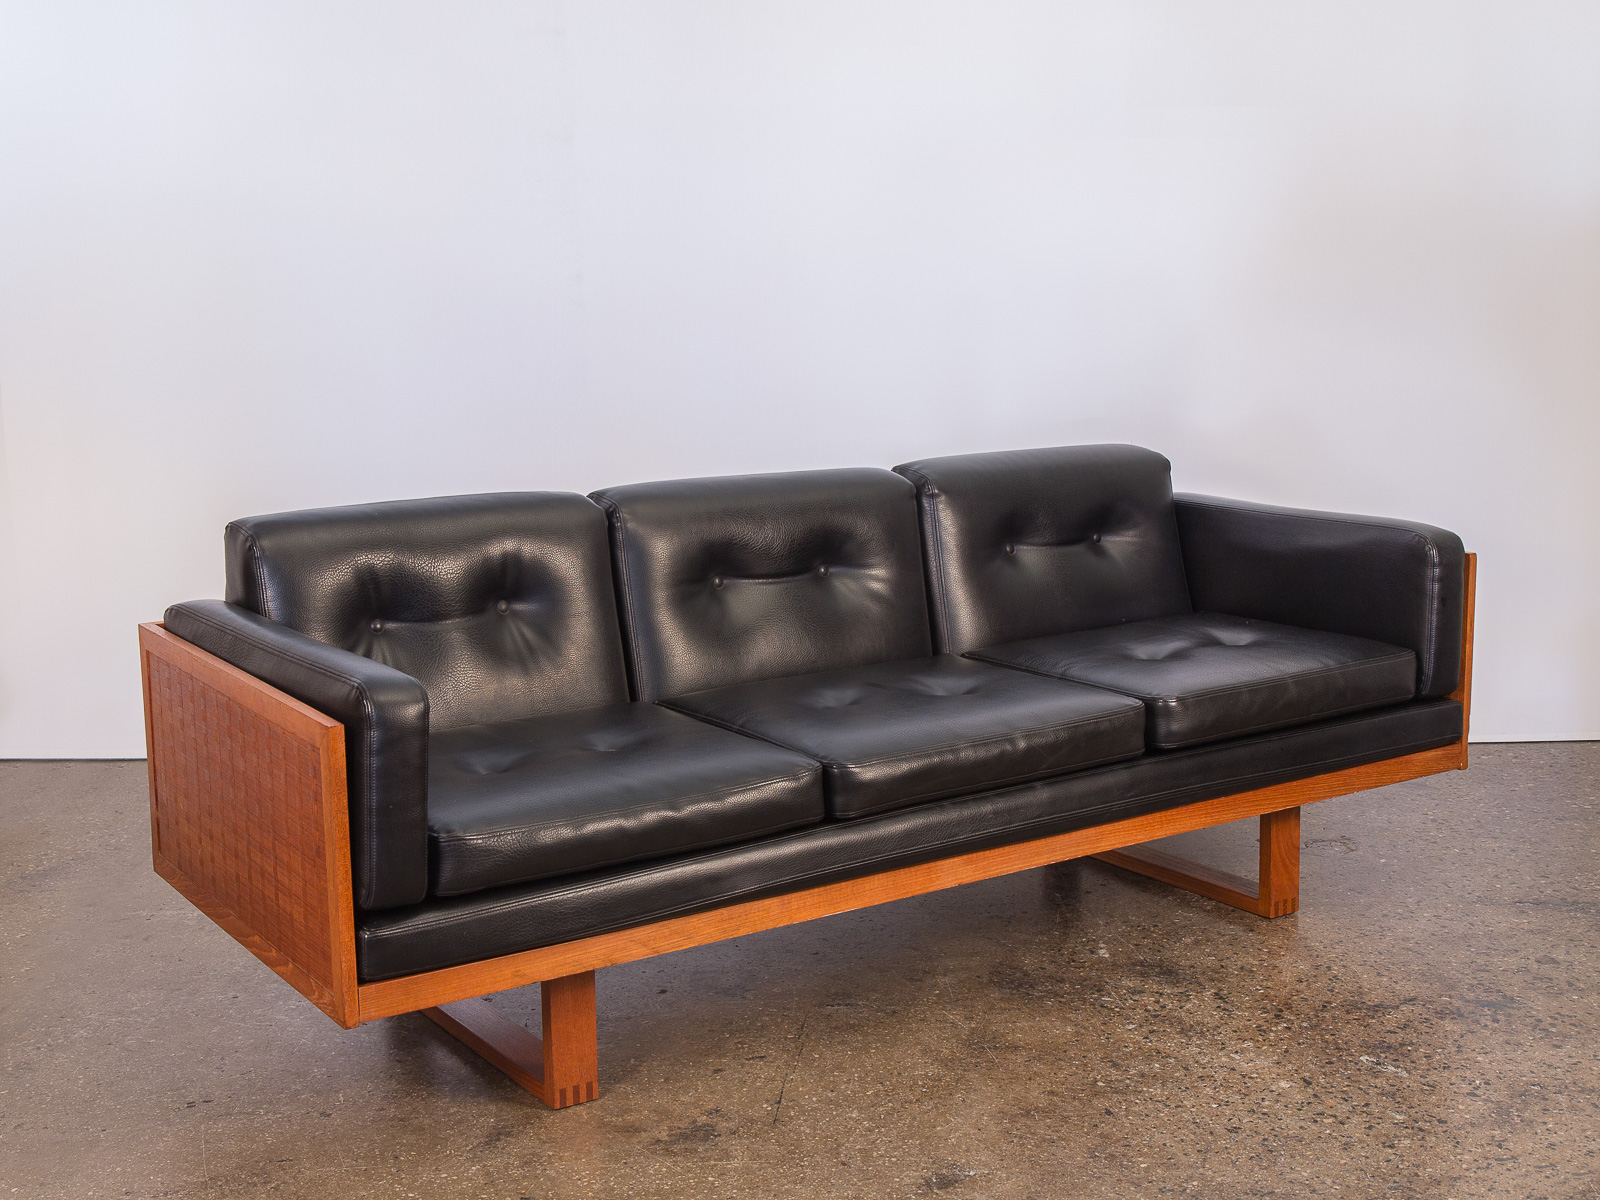 Poul Cadovius Woven Sofa